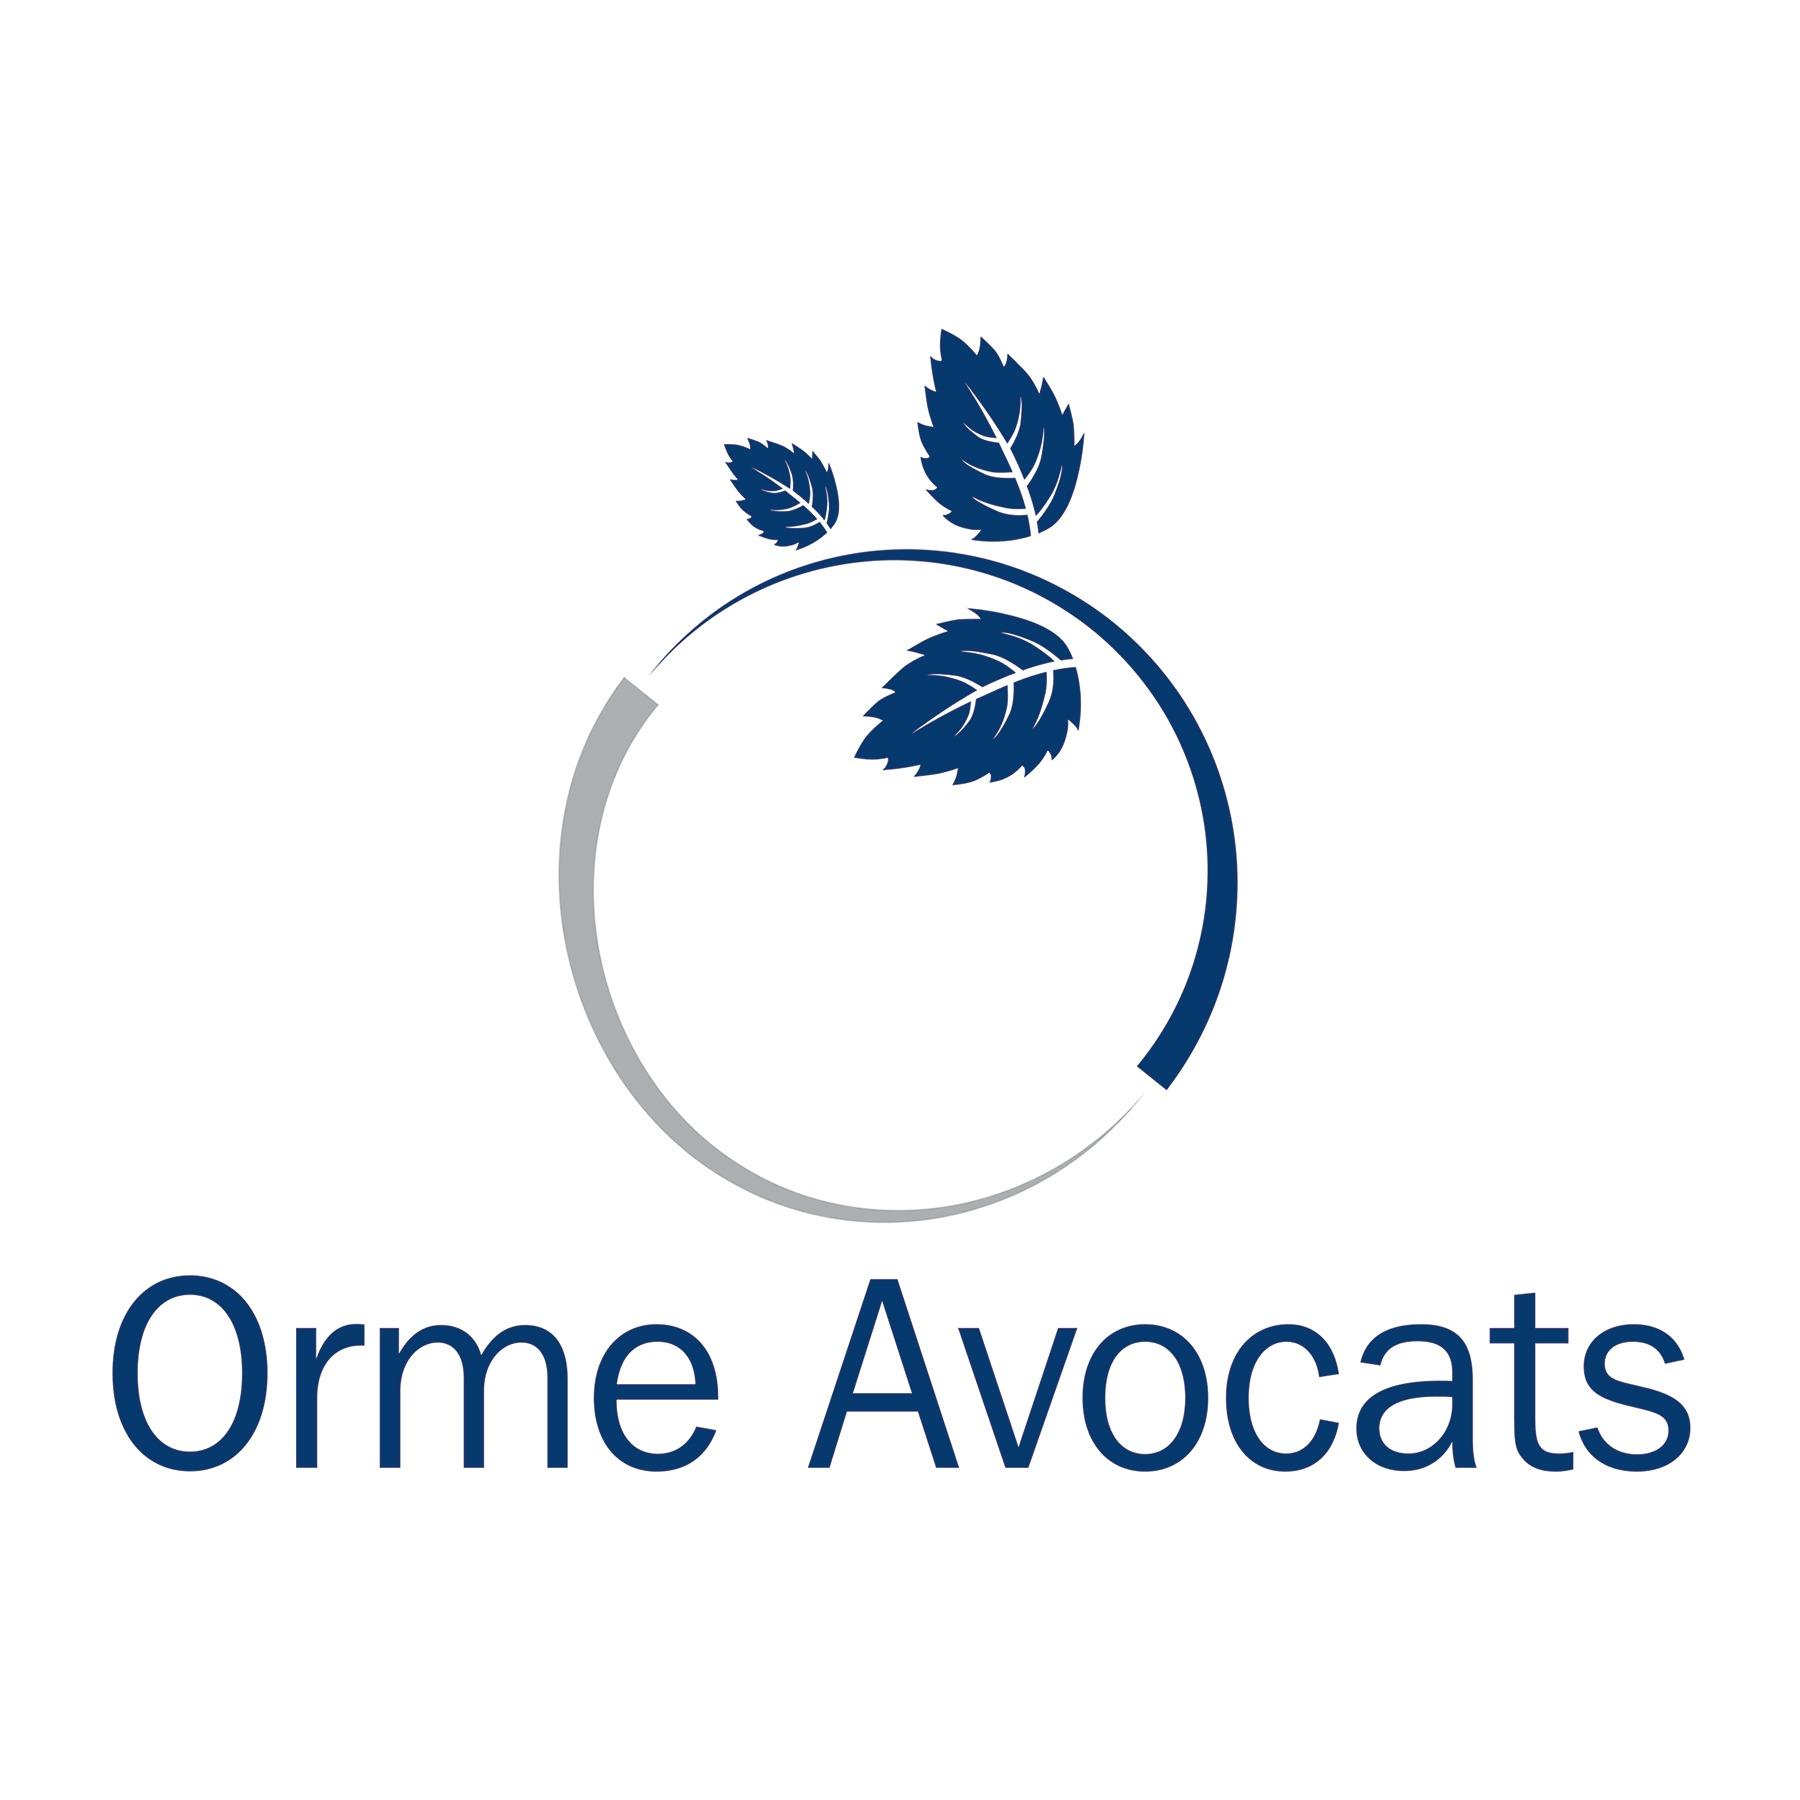 the Orme Avocats logo.